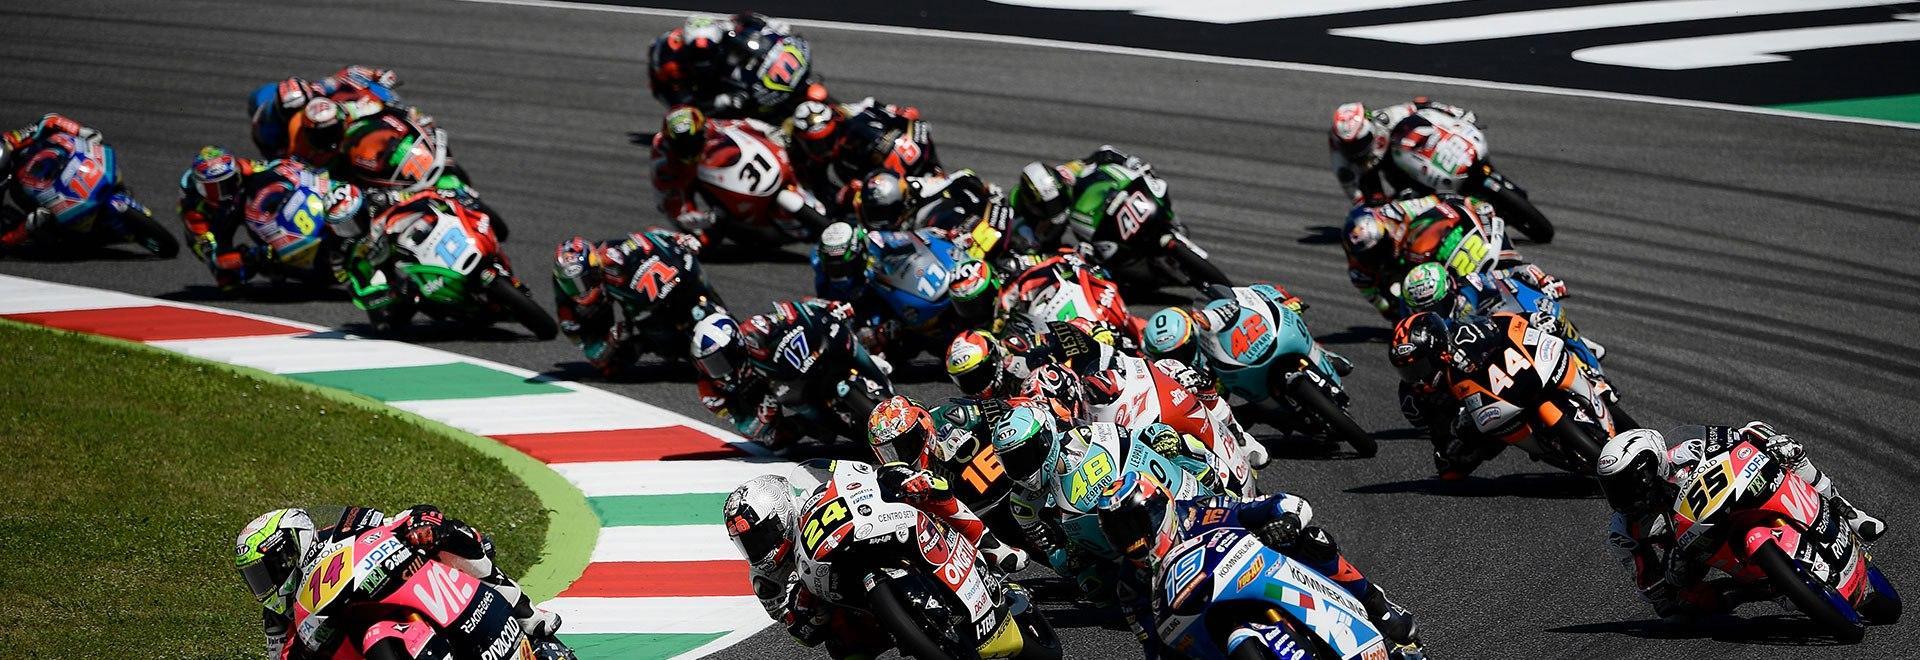 Supersport Mugello. Race 1